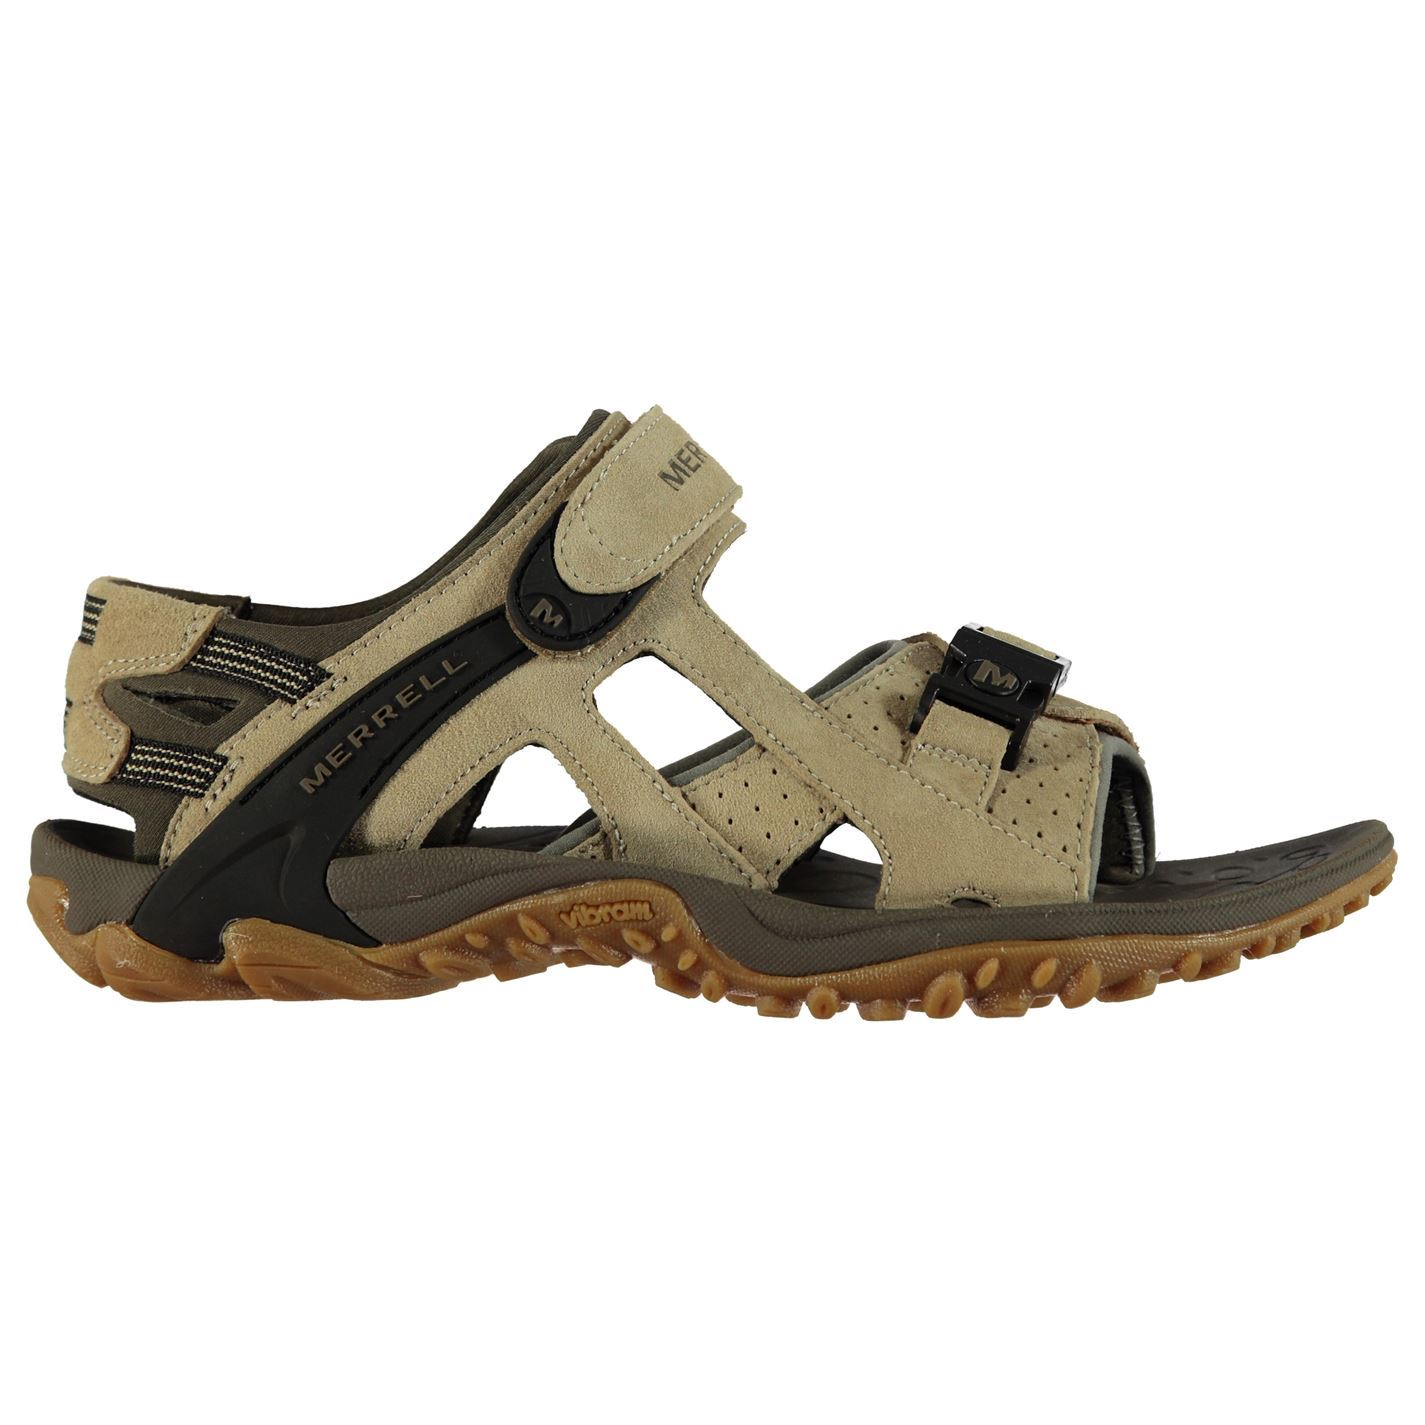 calzado merrell sandalias